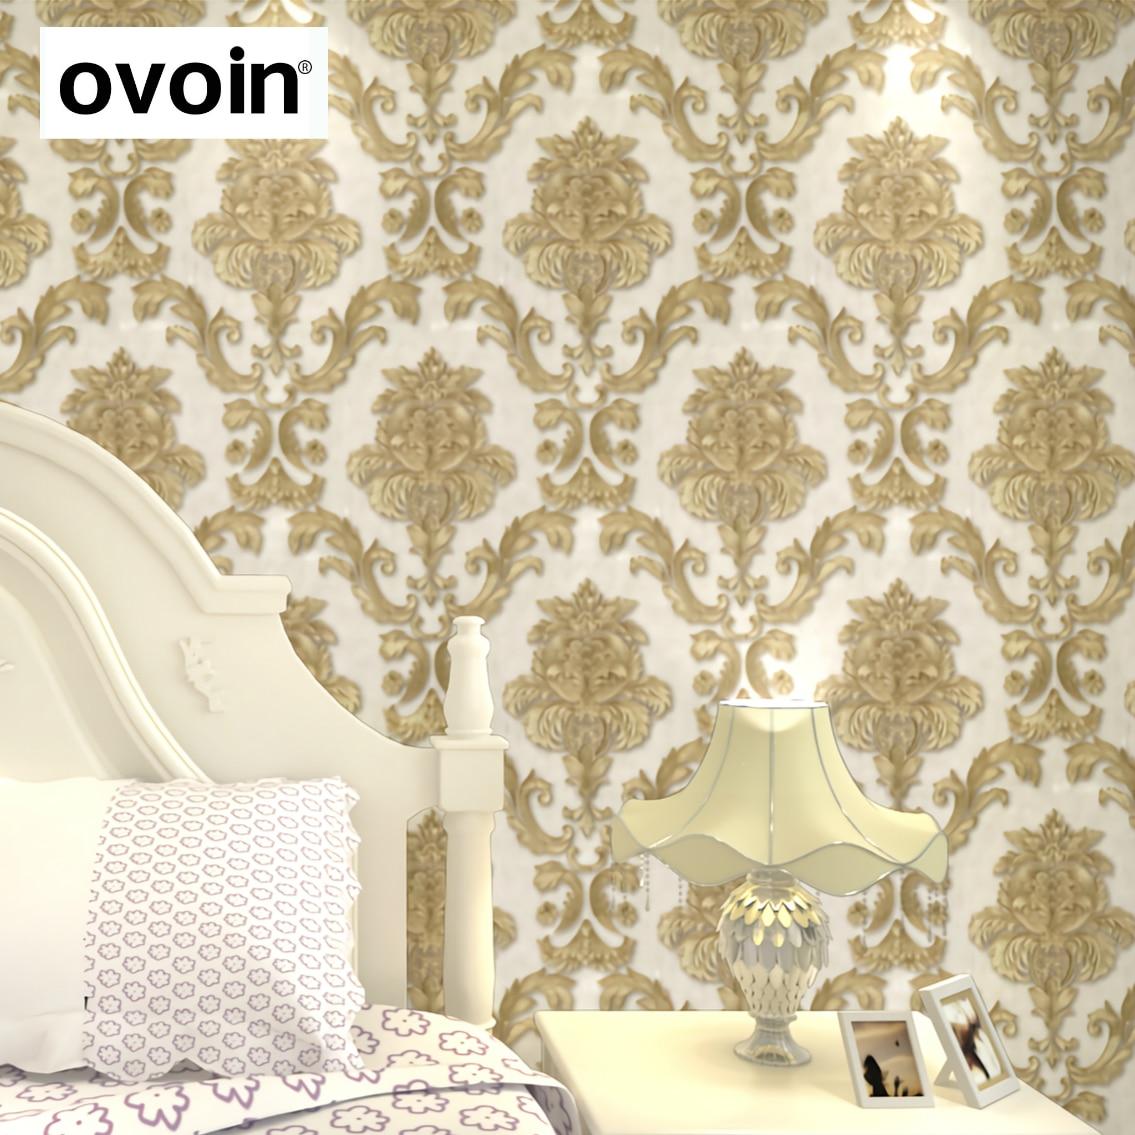 Modern Luxury Glitter Gold Damask Vinyl Wallpaper Roll